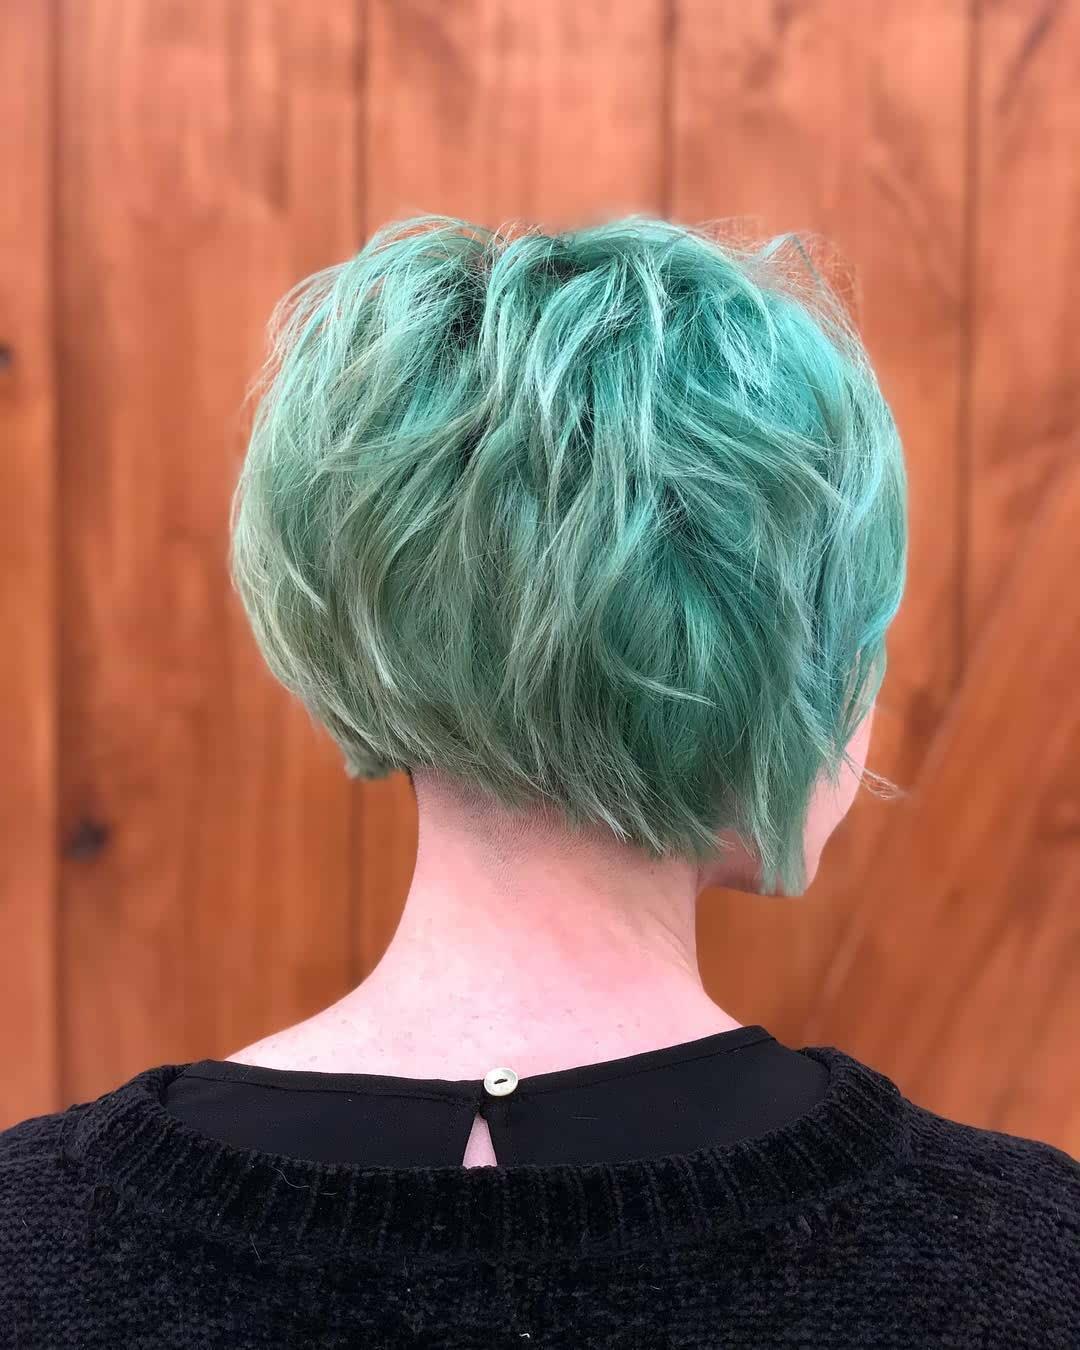 Hair Color Ideas for Bob Hairstyles (3)